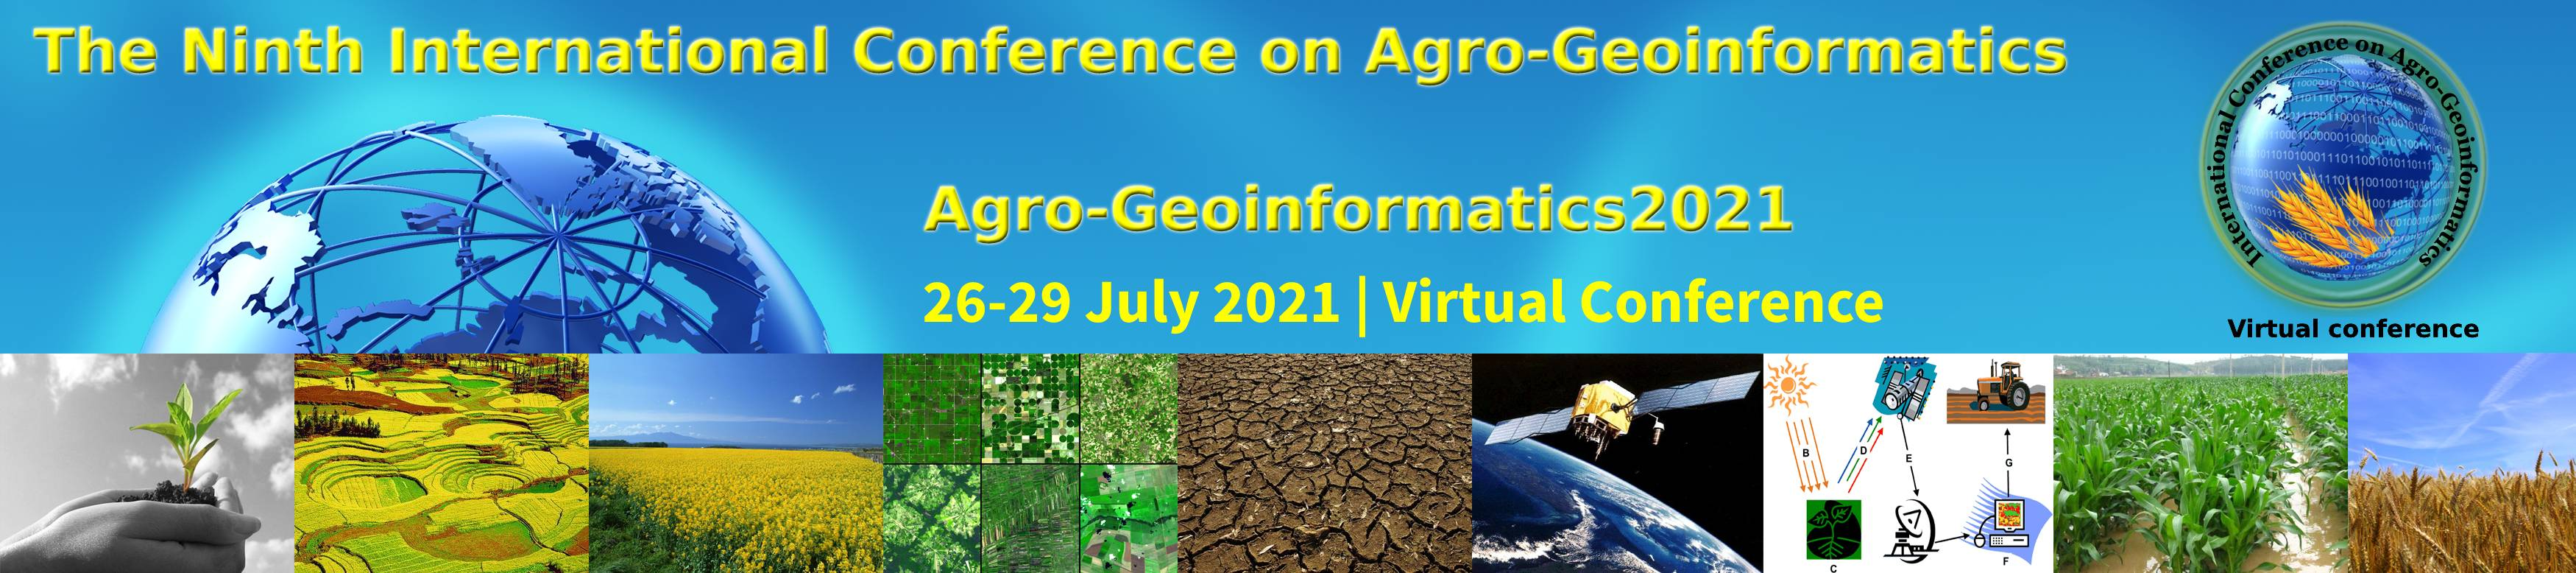 Agro-Geoinformatics